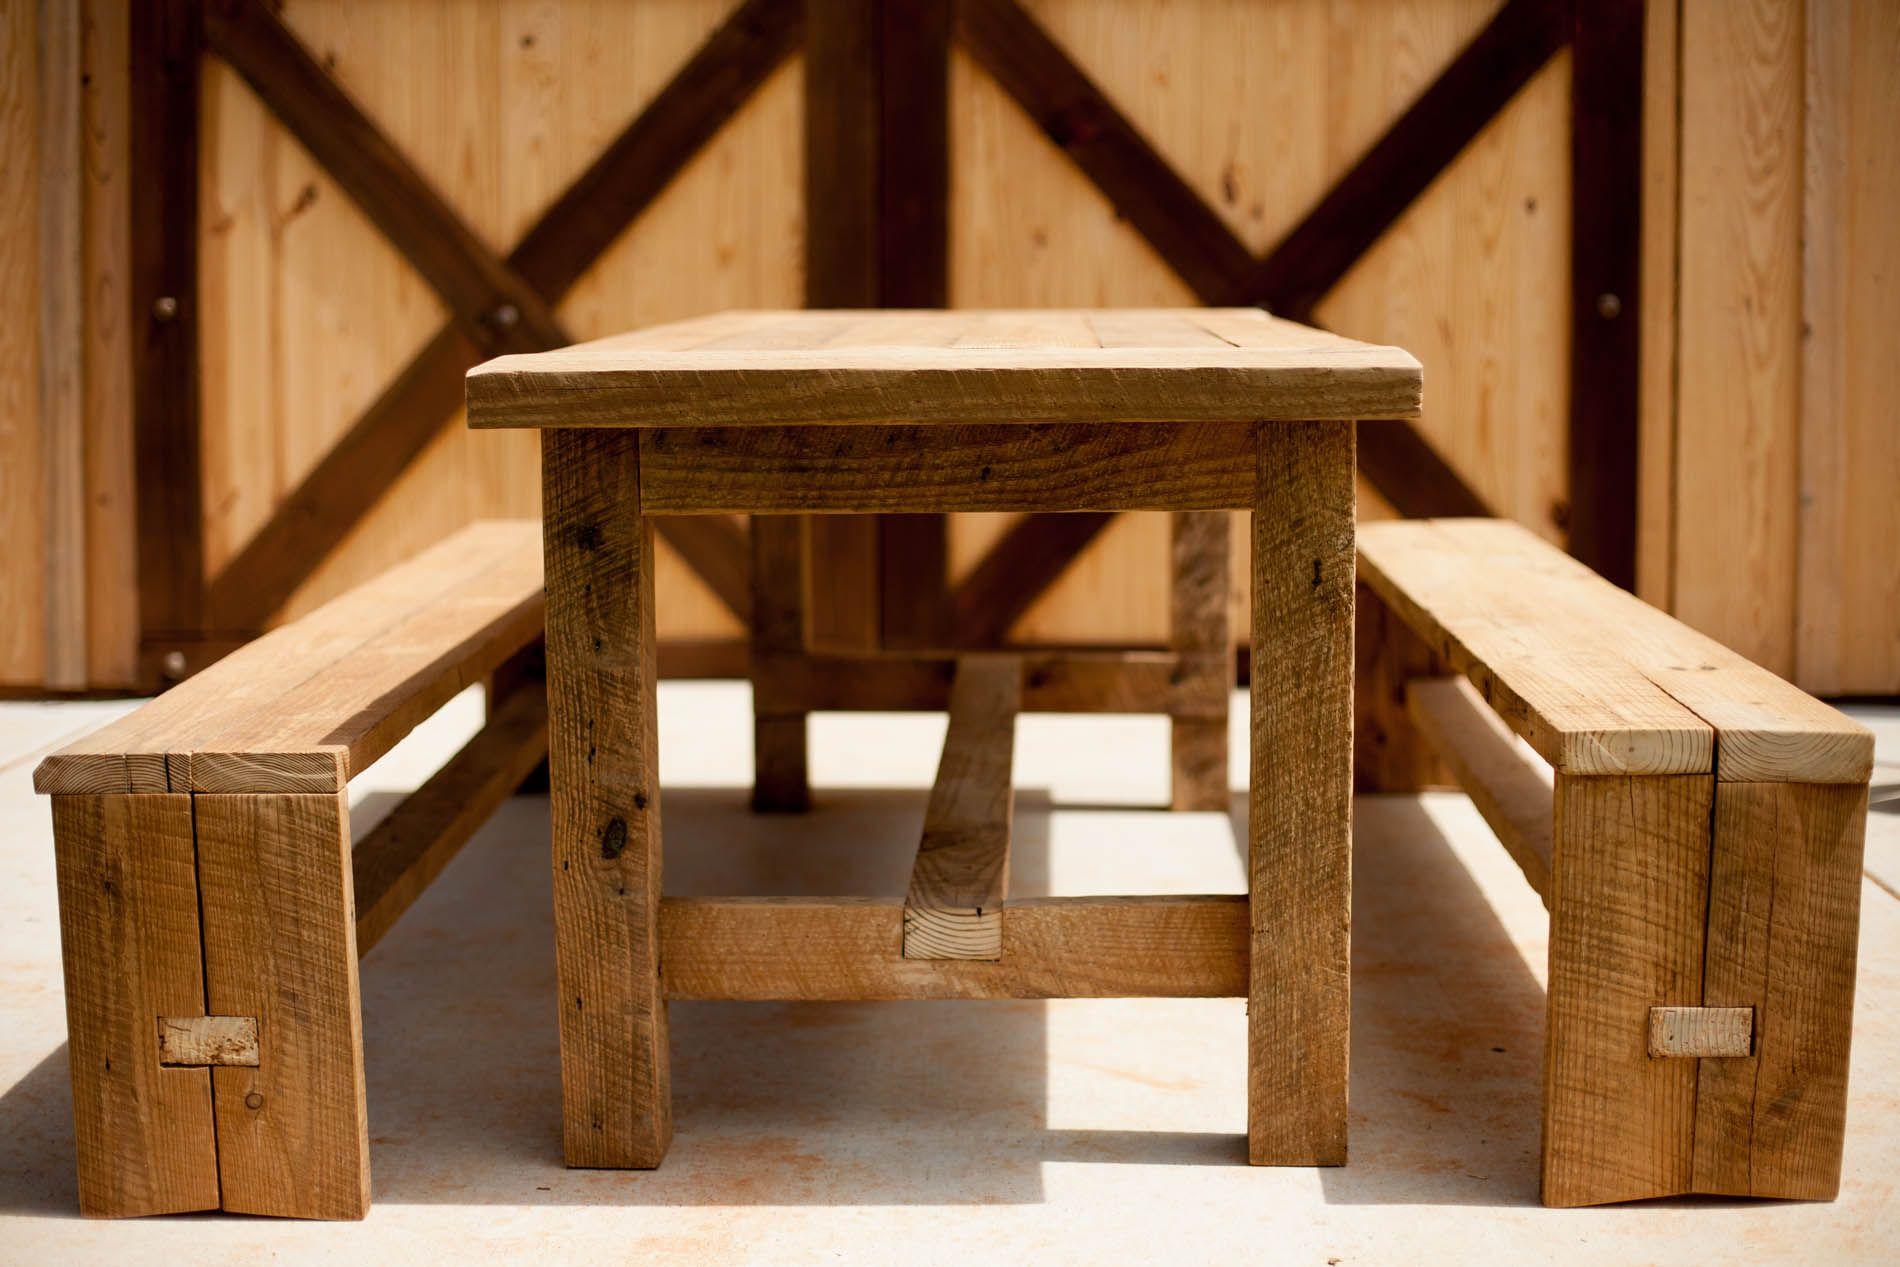 Reclaimed Wood | Farm Table | Woodworking | Athens | Atlanta, GA ...